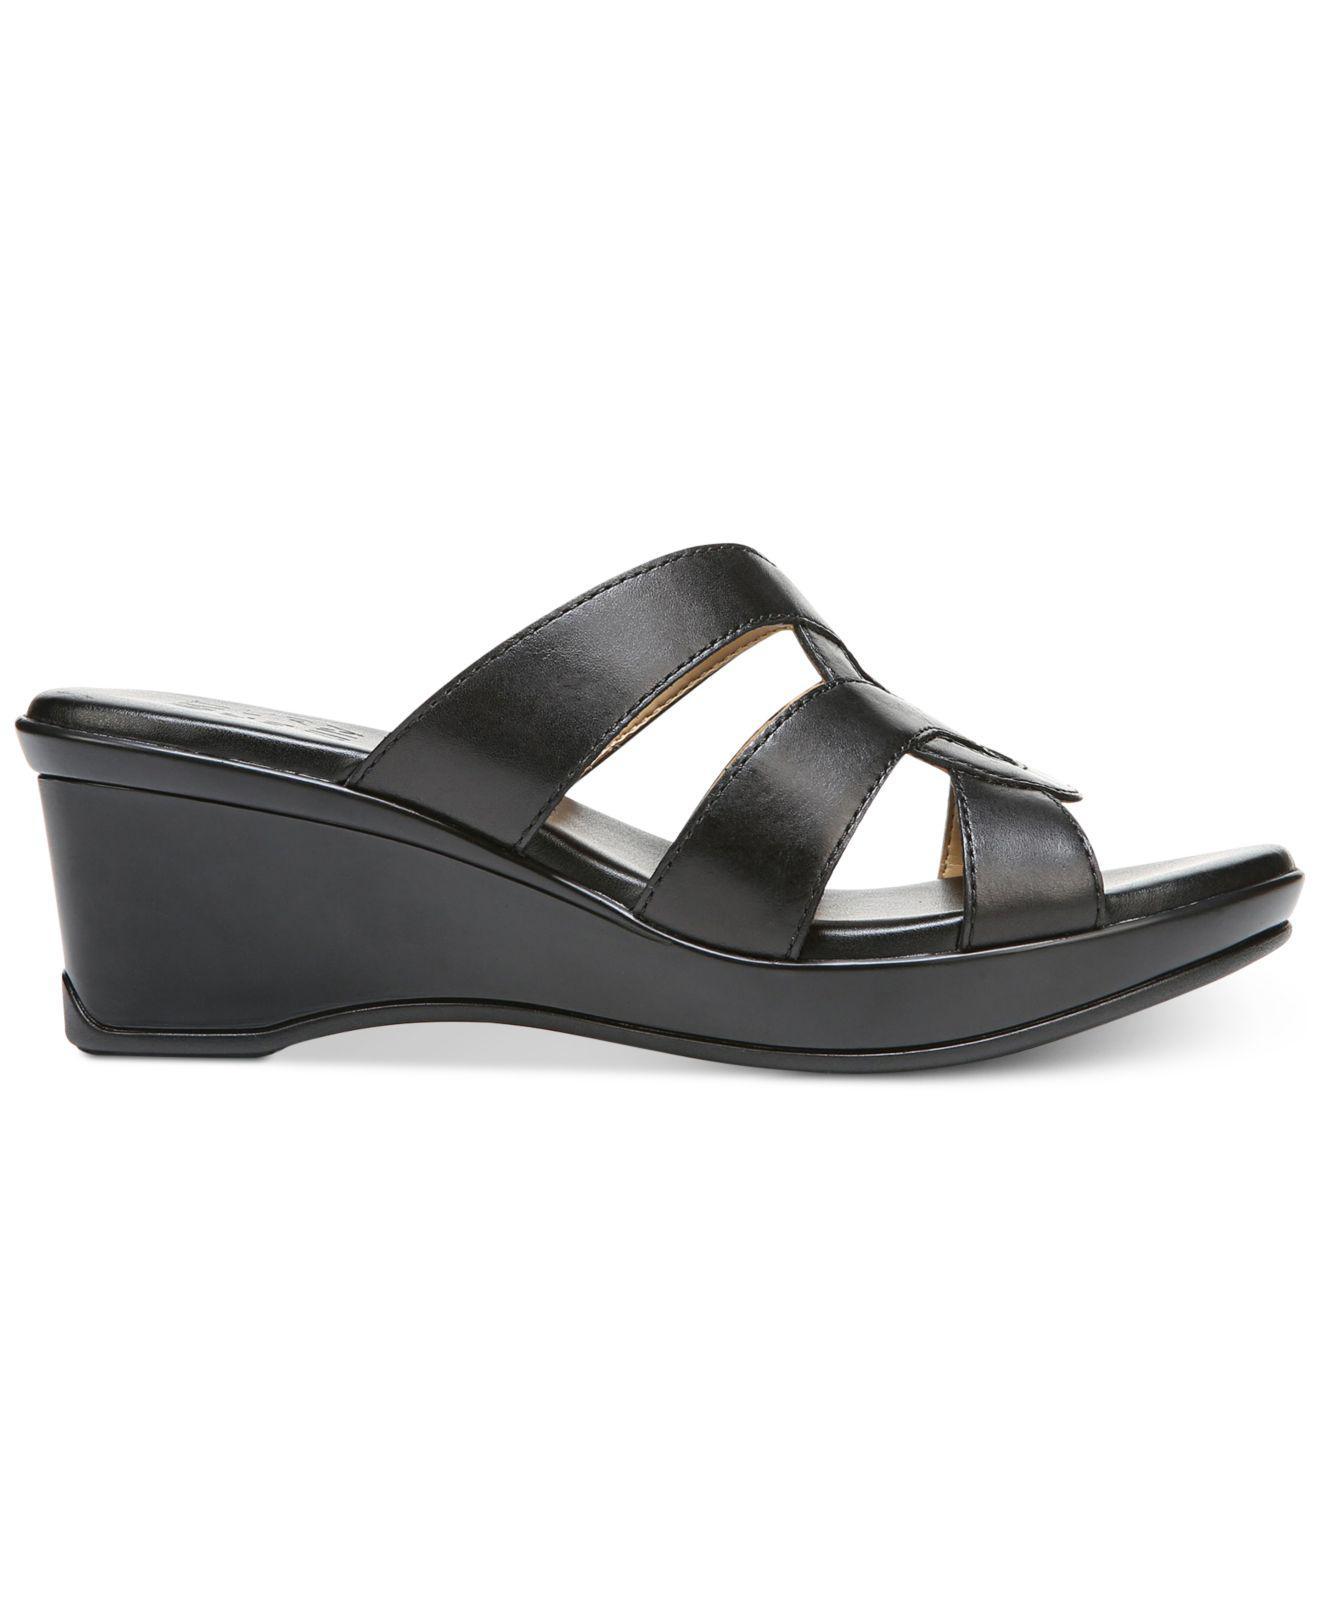 86b4c544981 Lyst - Naturalizer Violet Wedge Sandals in Black